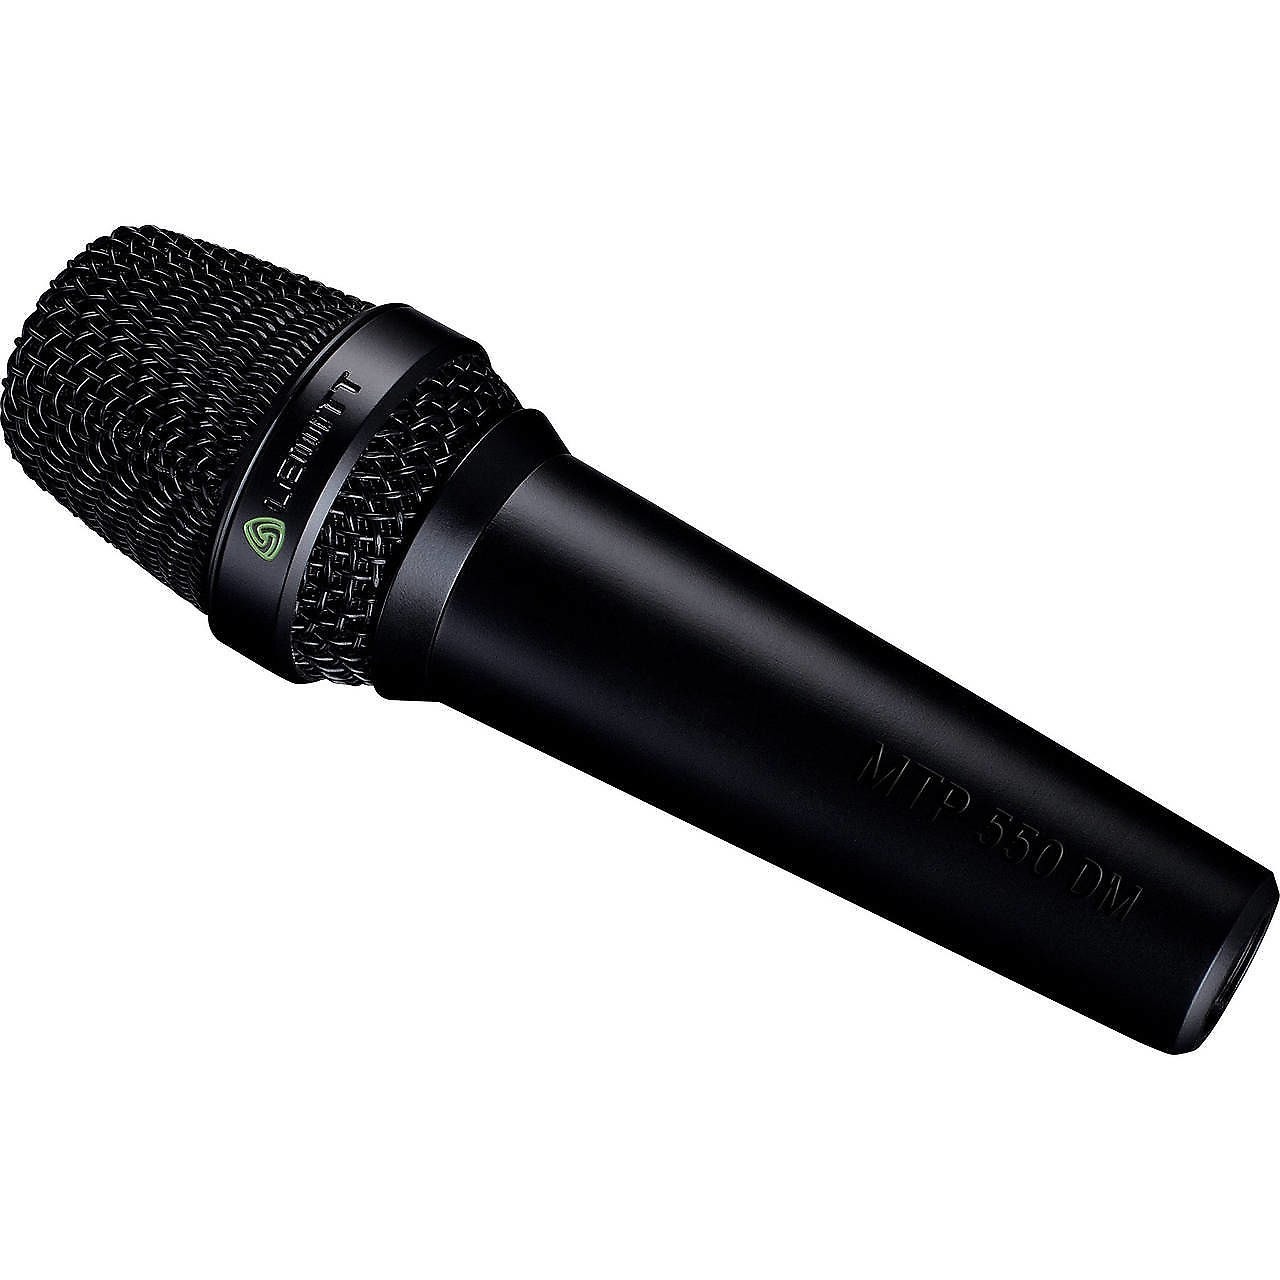 lewitt mtp 550 dm performance dynamic microphone reverb. Black Bedroom Furniture Sets. Home Design Ideas